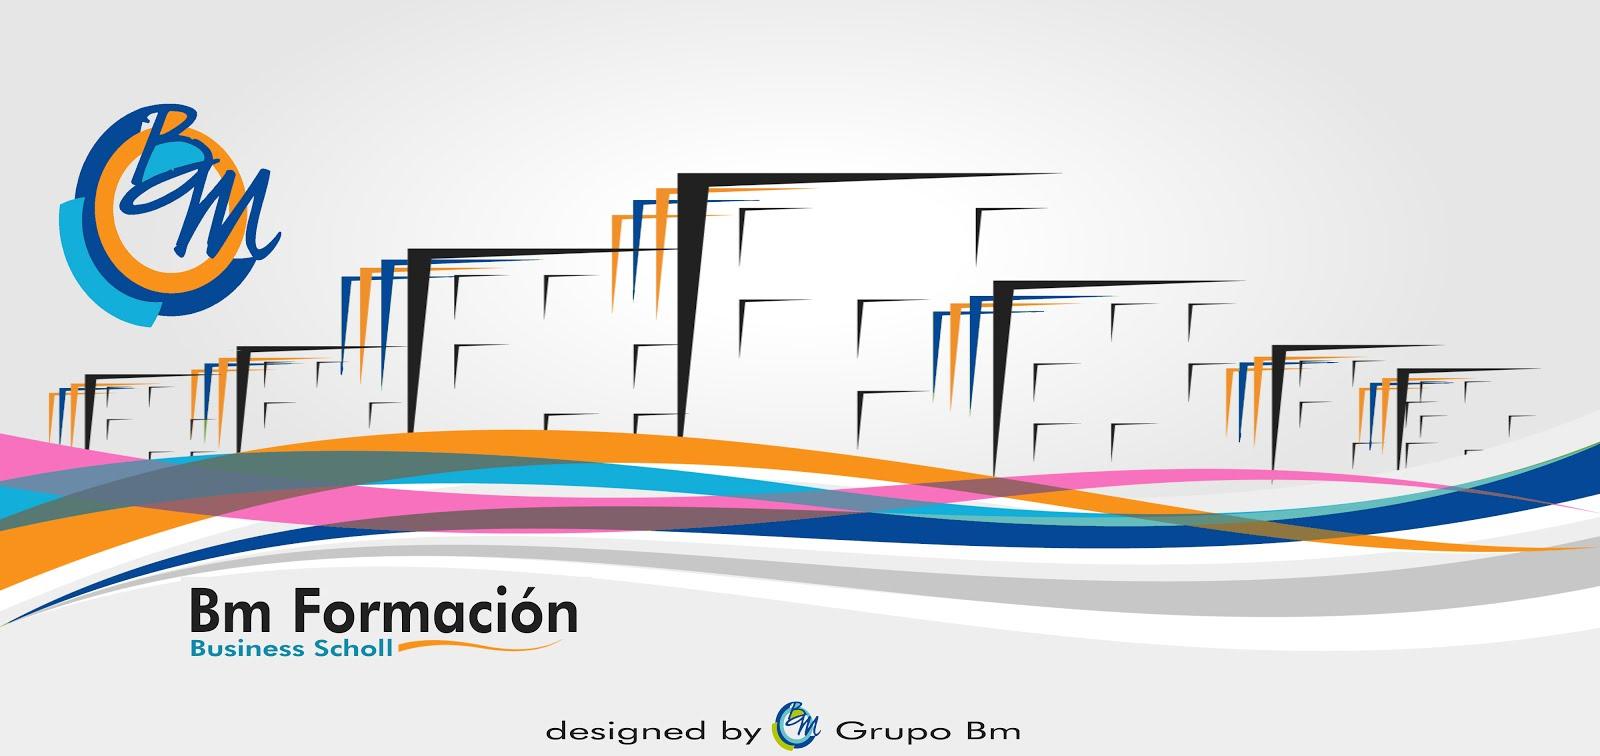 Bm Formacion